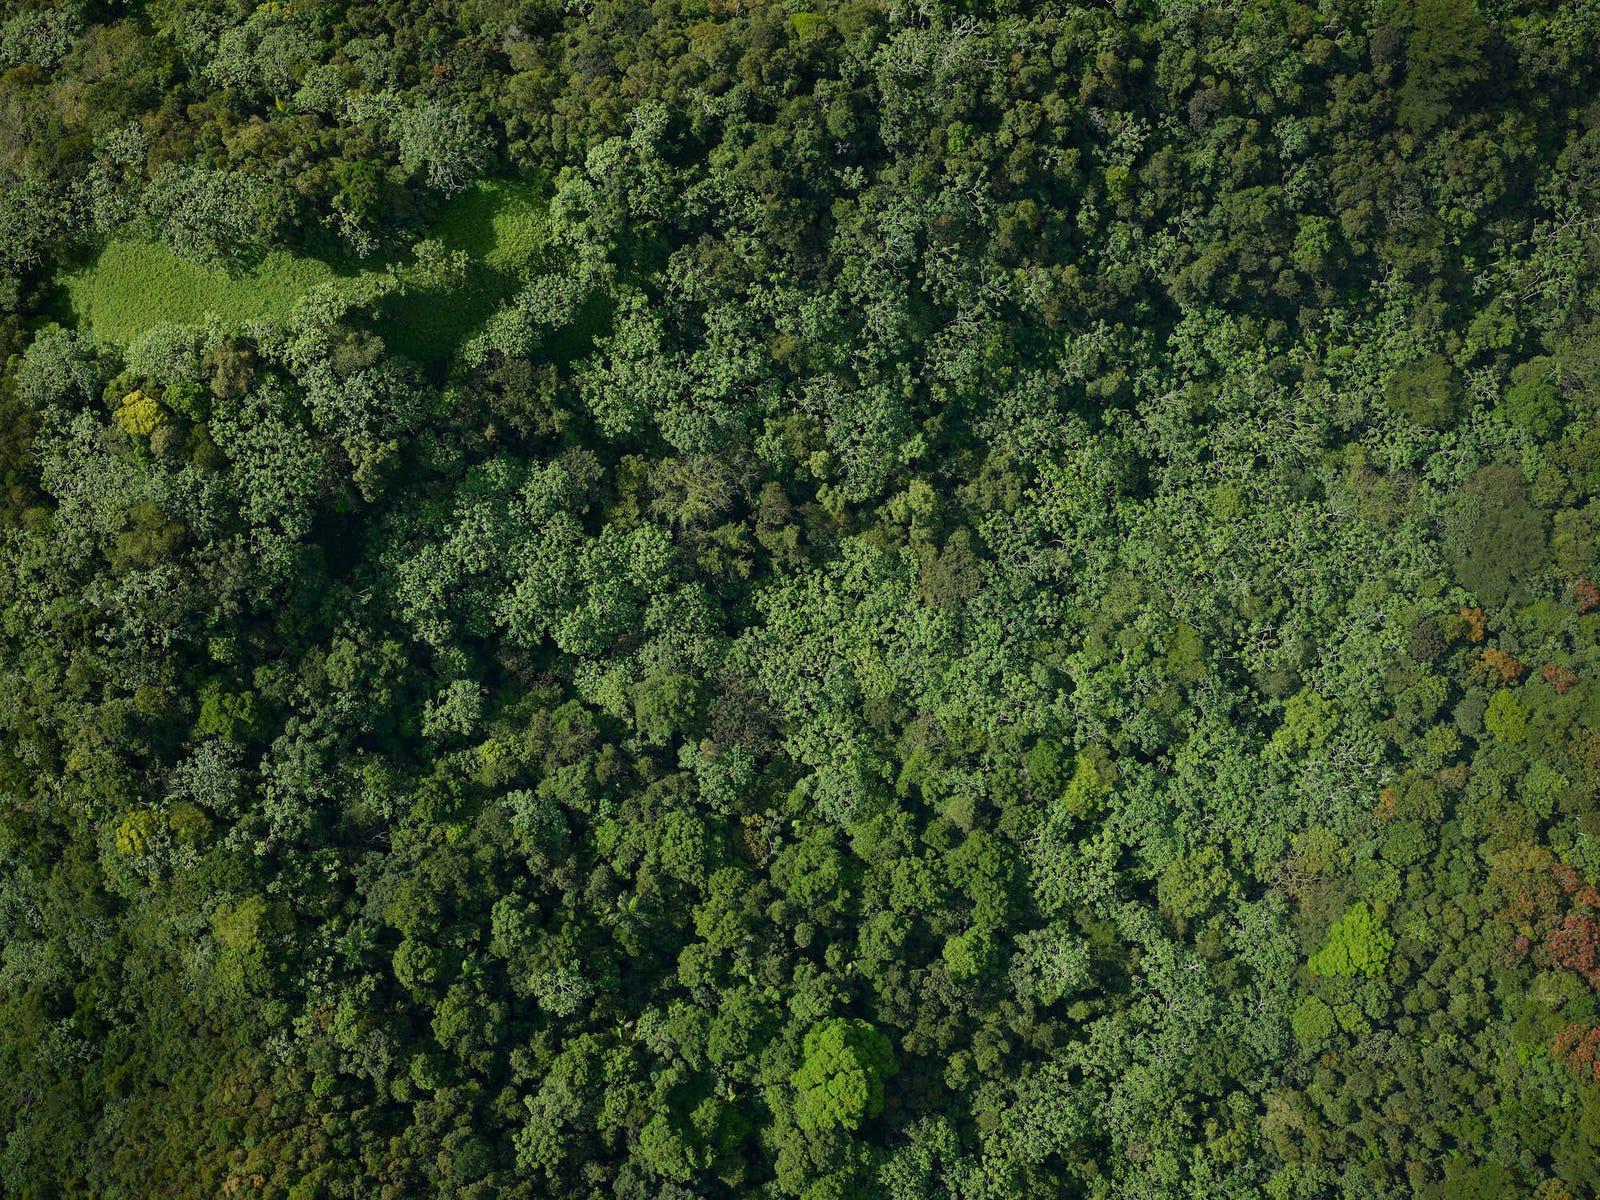 The El Yunque rainforest near El Verde field station, 2017